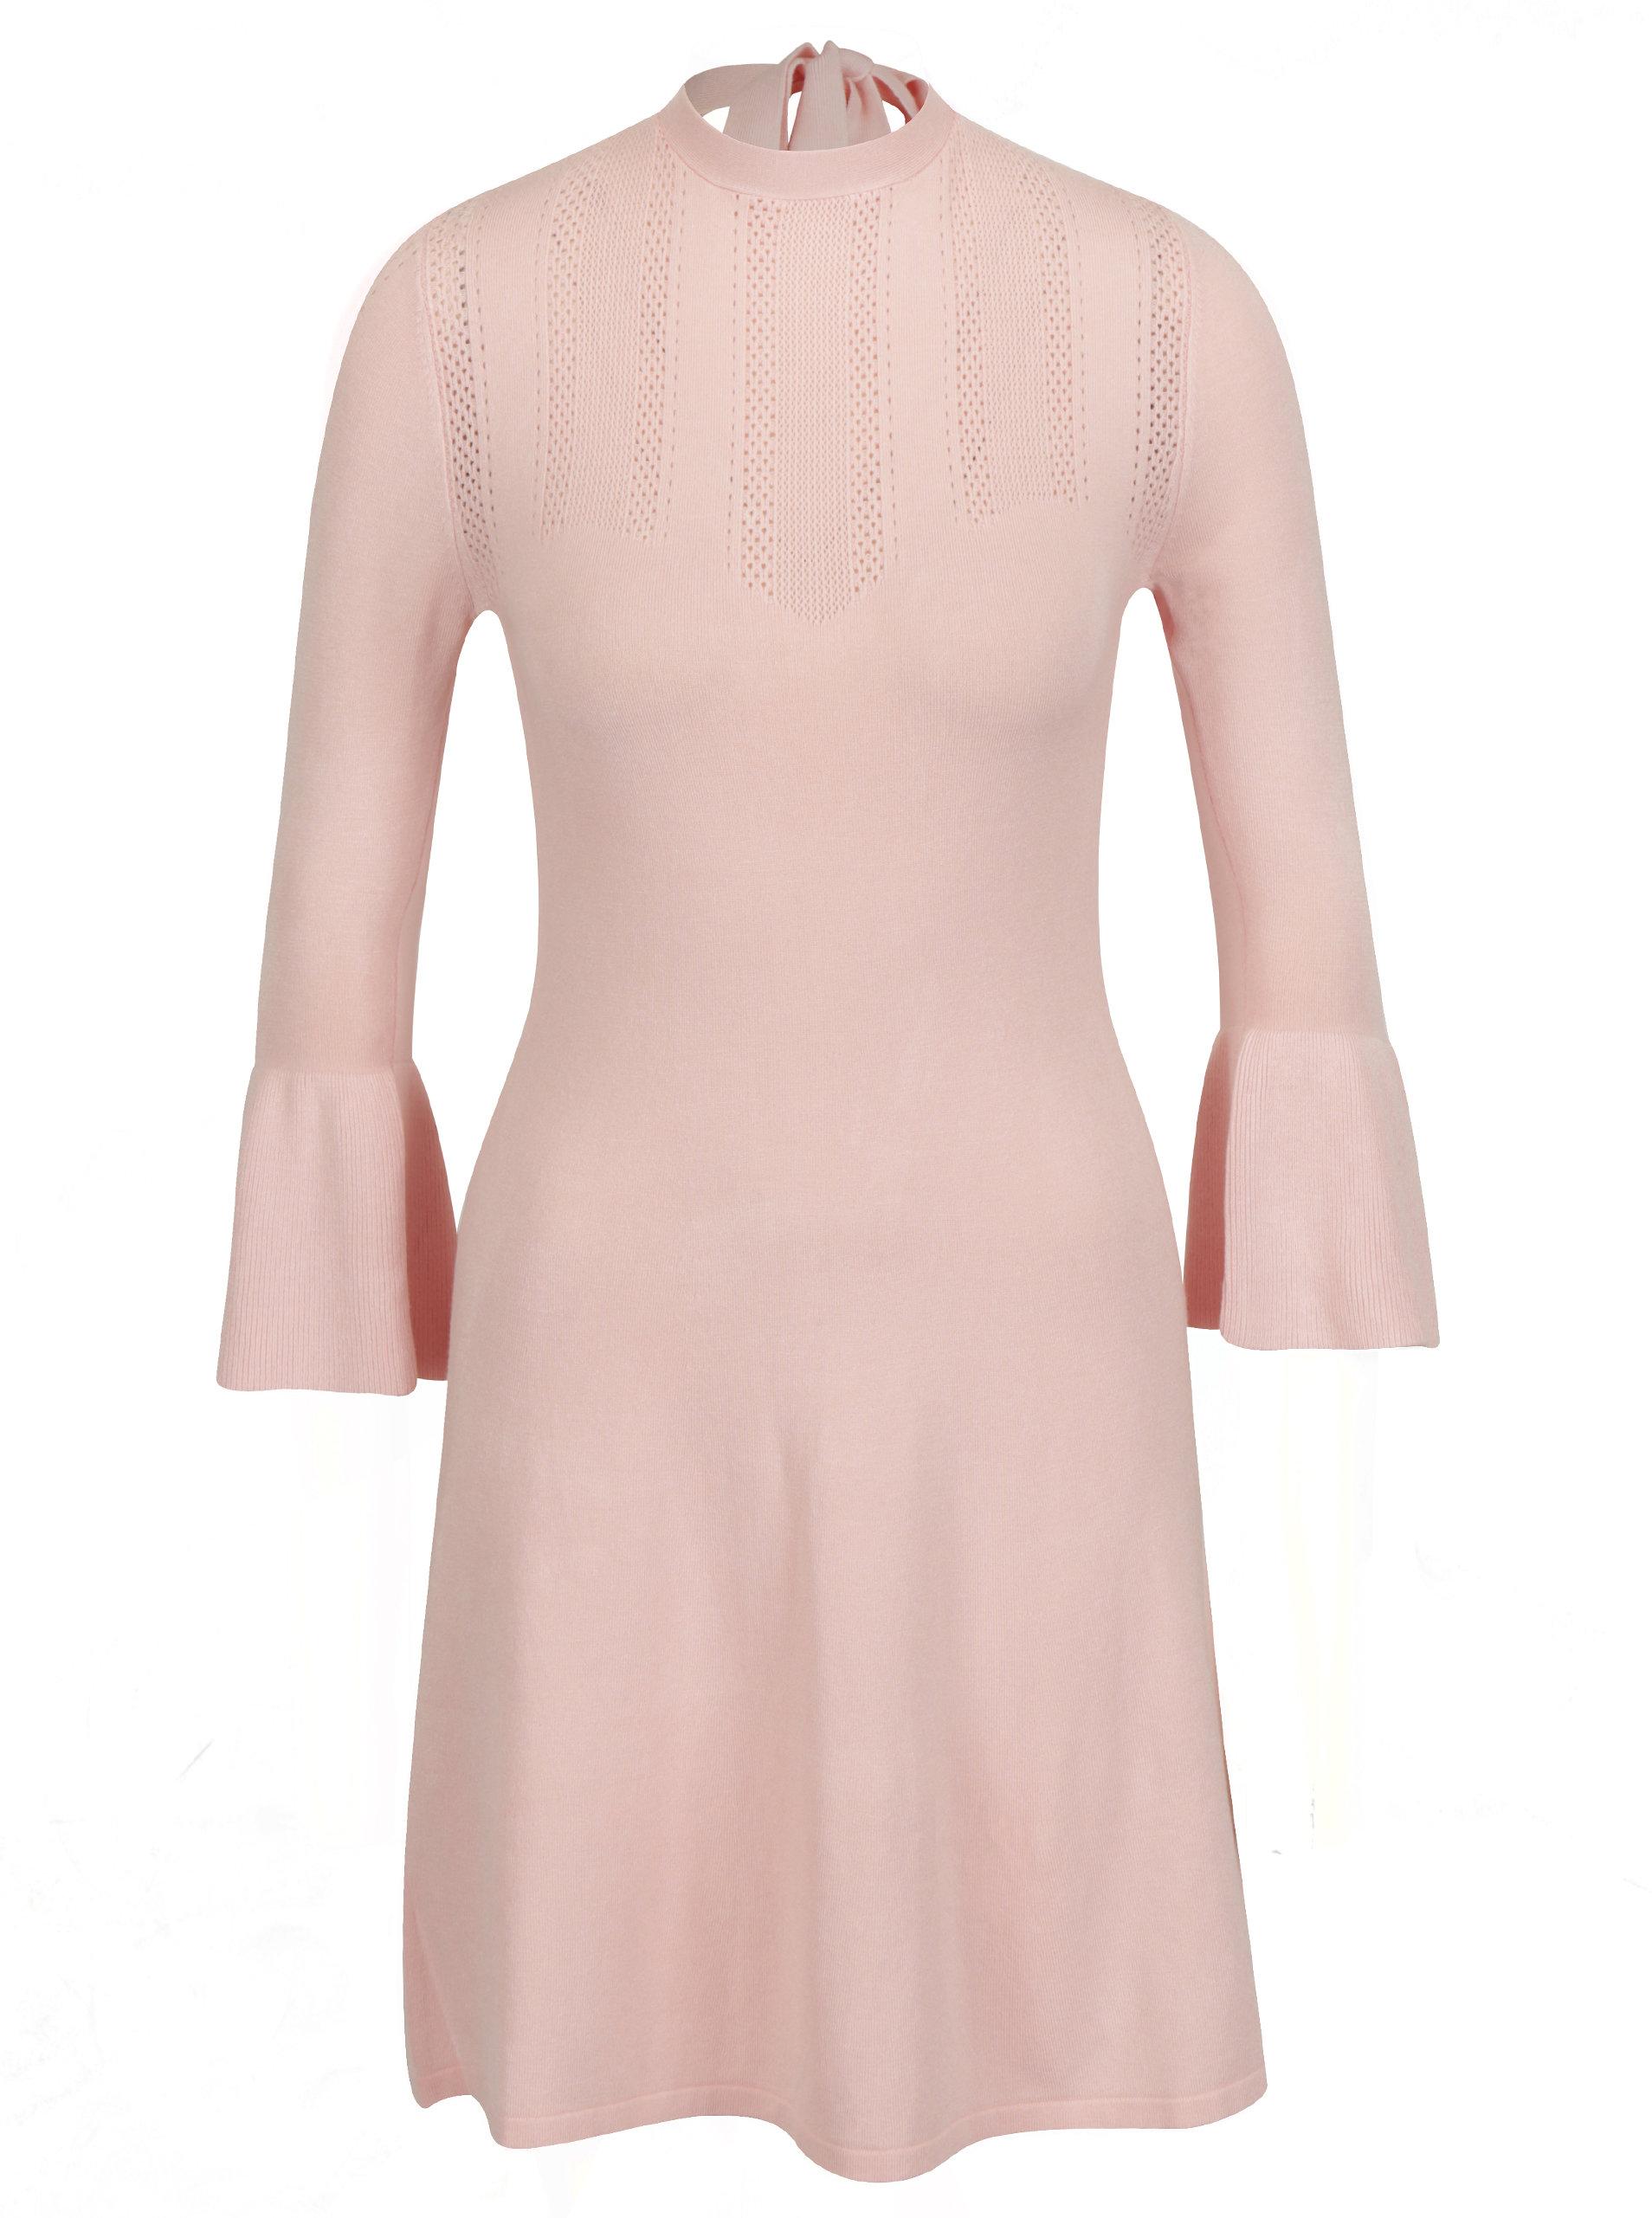 aaa9a3897cb3 Světle růžové svetrové šaty s volány Miss Selfridge ...